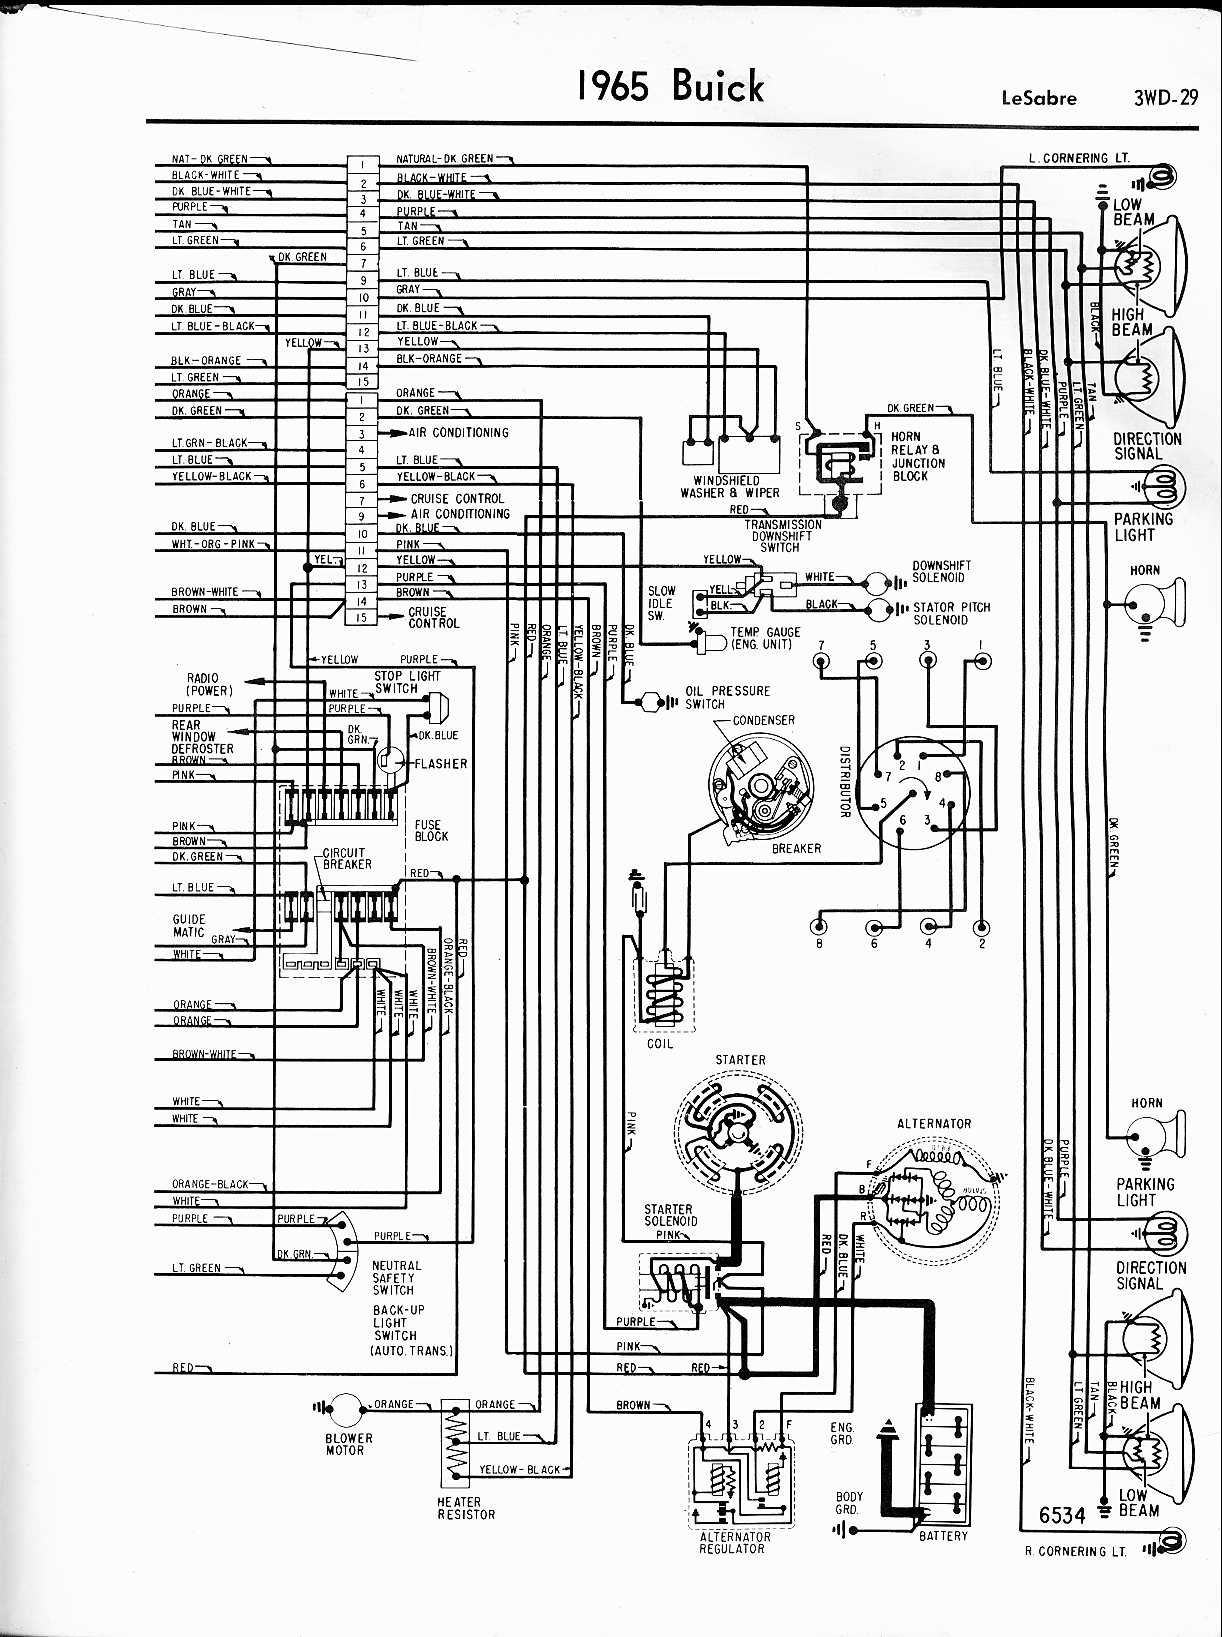 Swell 1972 C30 Wiring Diagram Wiring Diagram Database Wiring Cloud Apomsimijknierdonabenoleattemohammedshrineorg